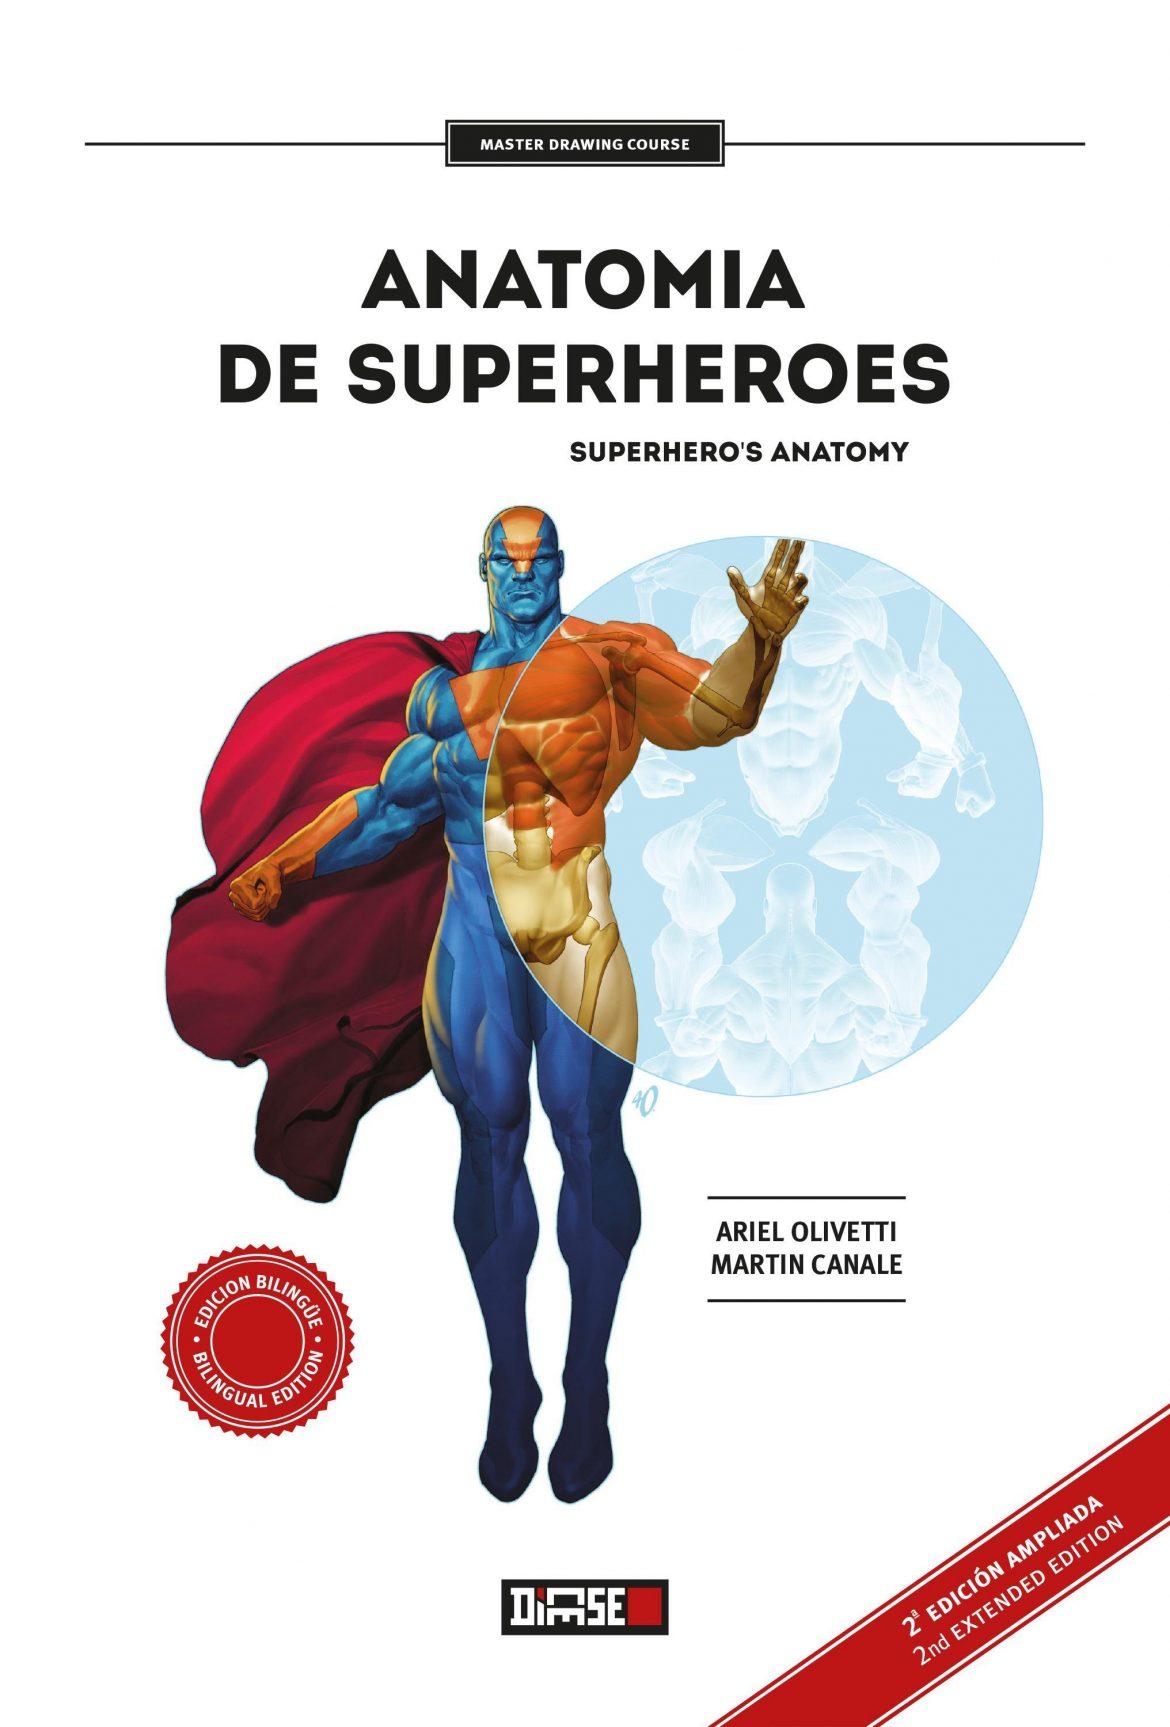 S de superman para imprimir, masquelibros